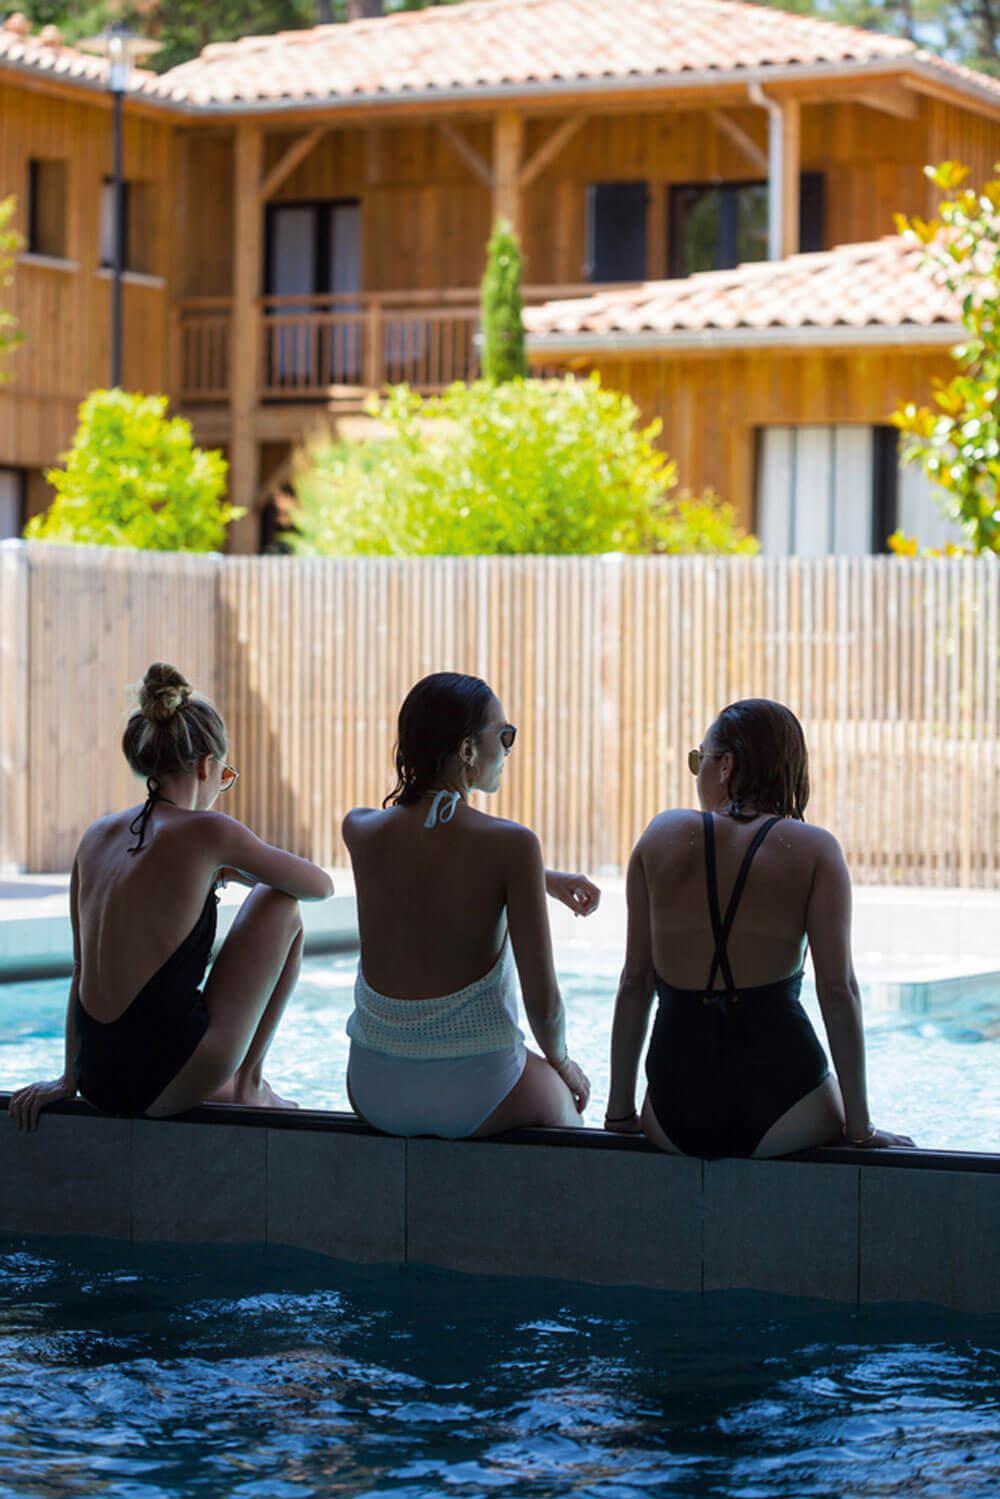 Domaine Ferret thalasso piscine exterieure